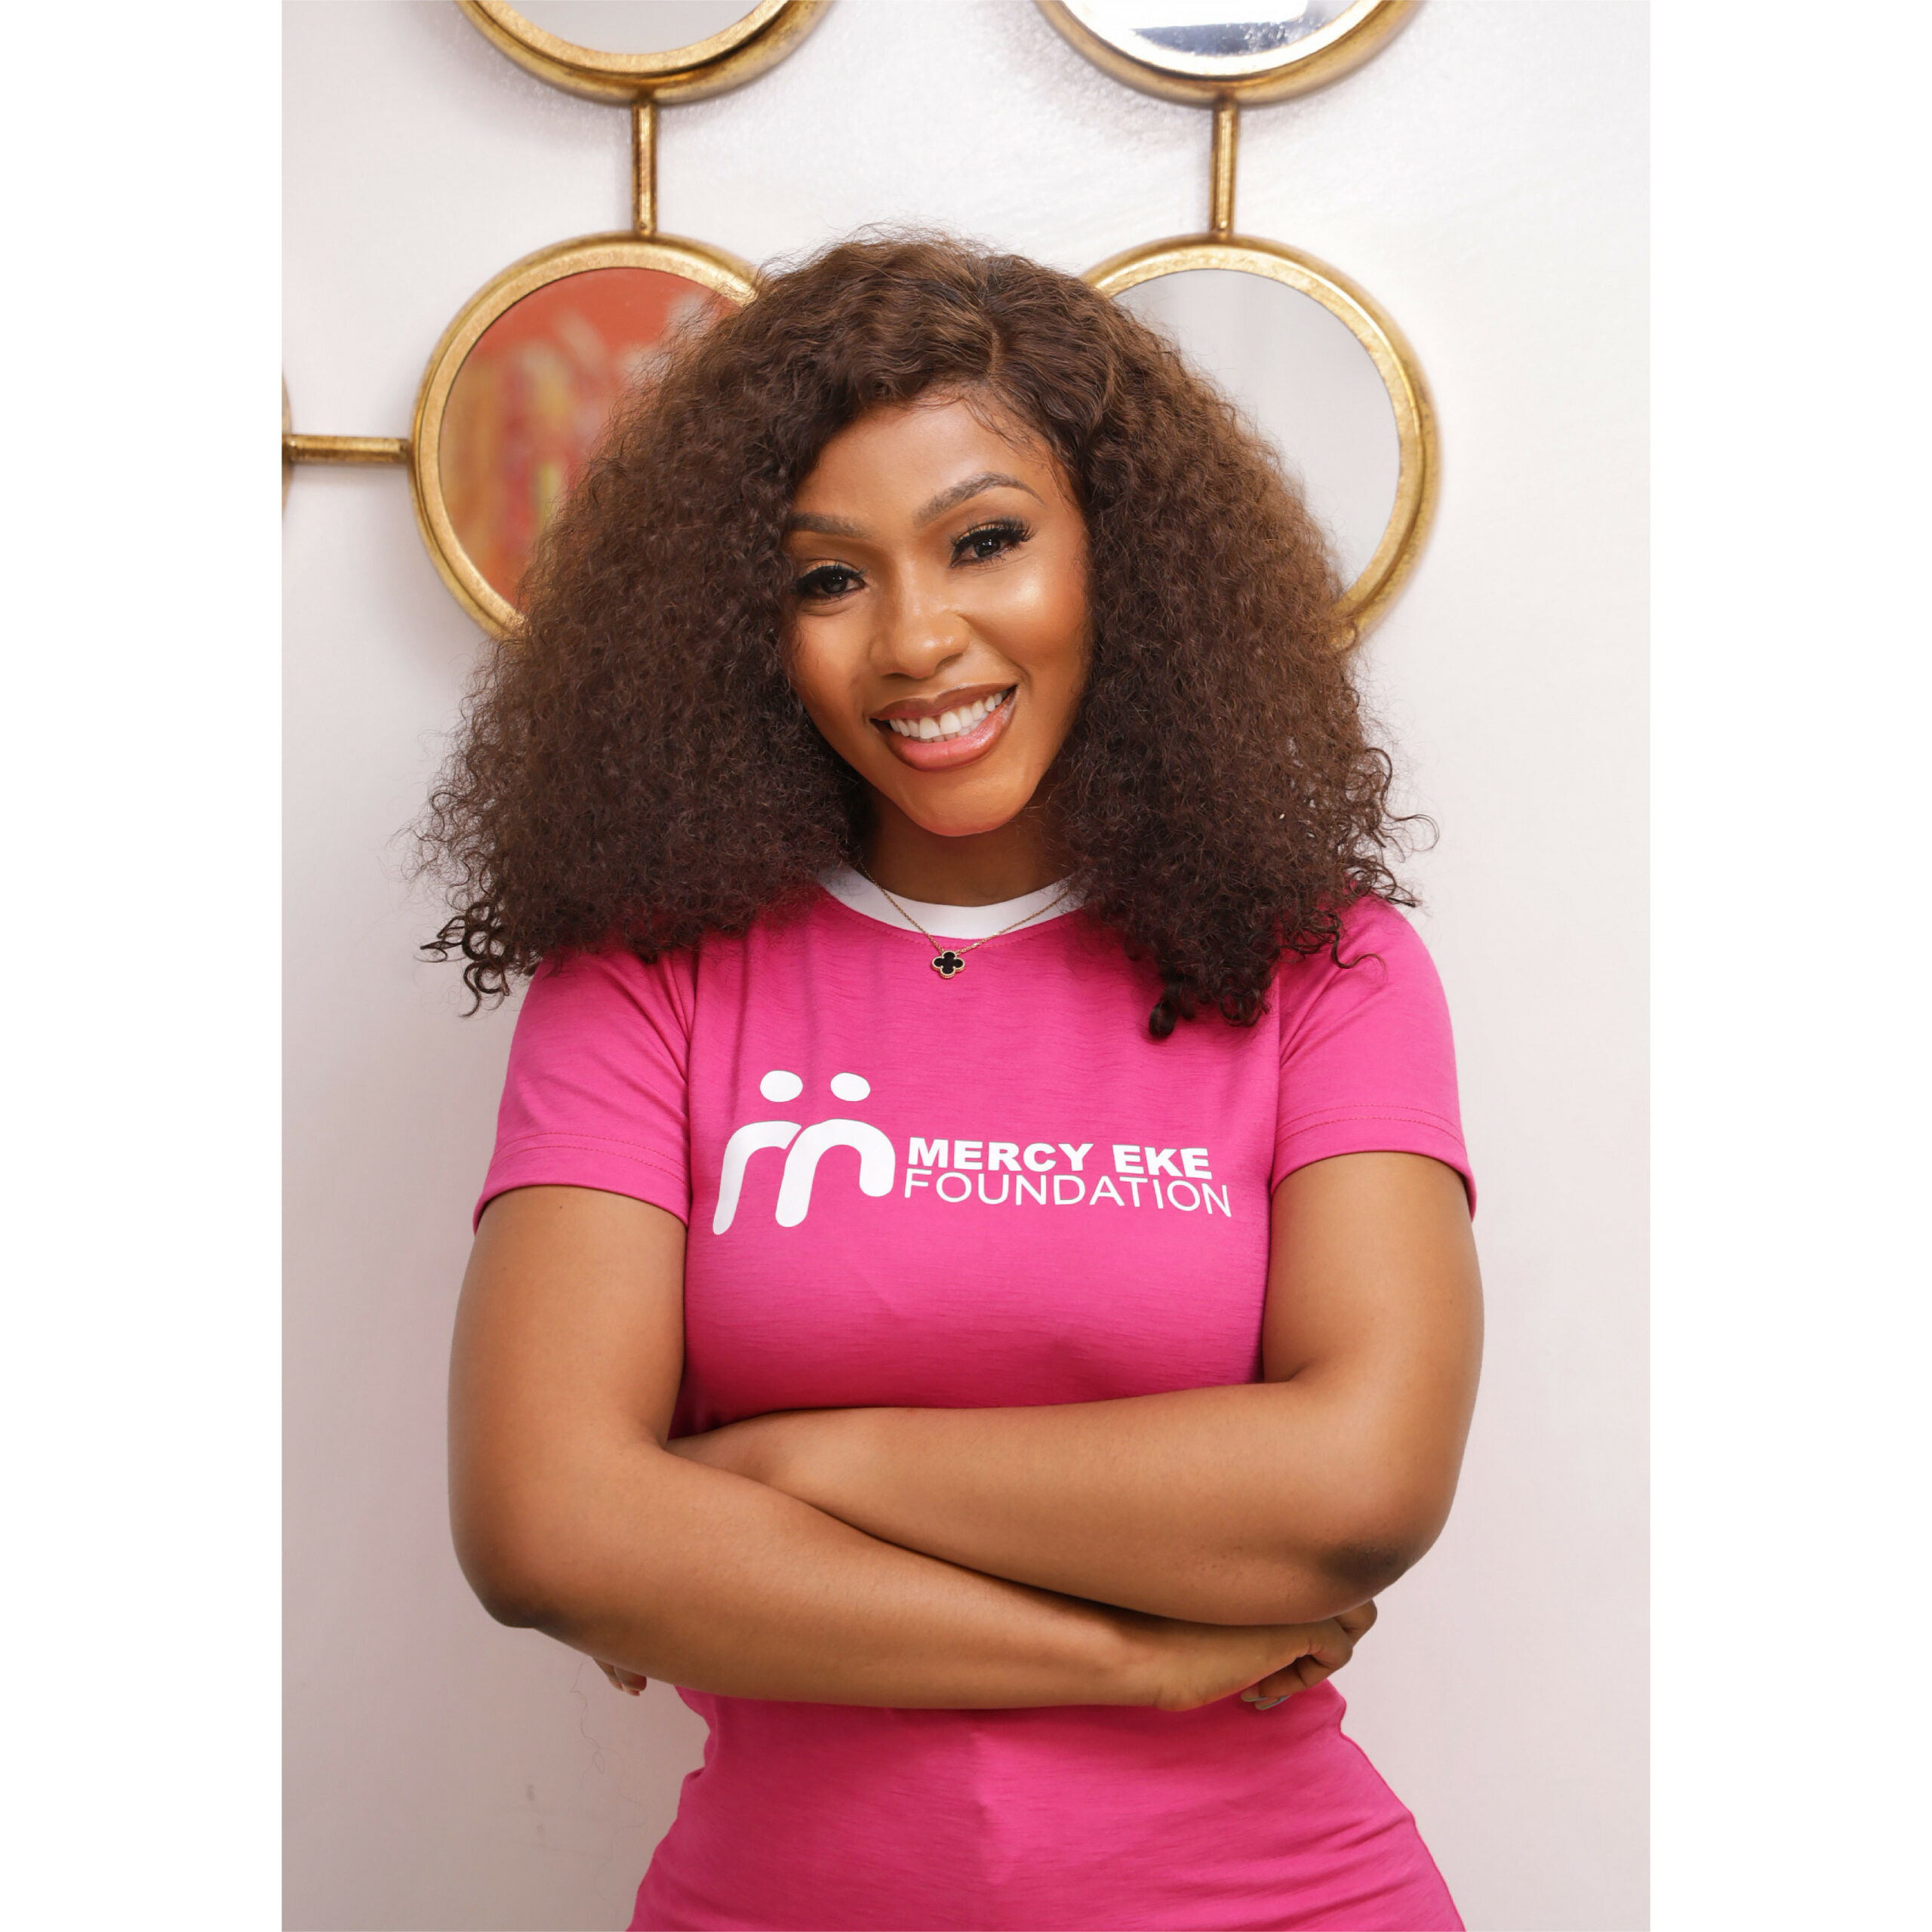 Mercy Eke launches